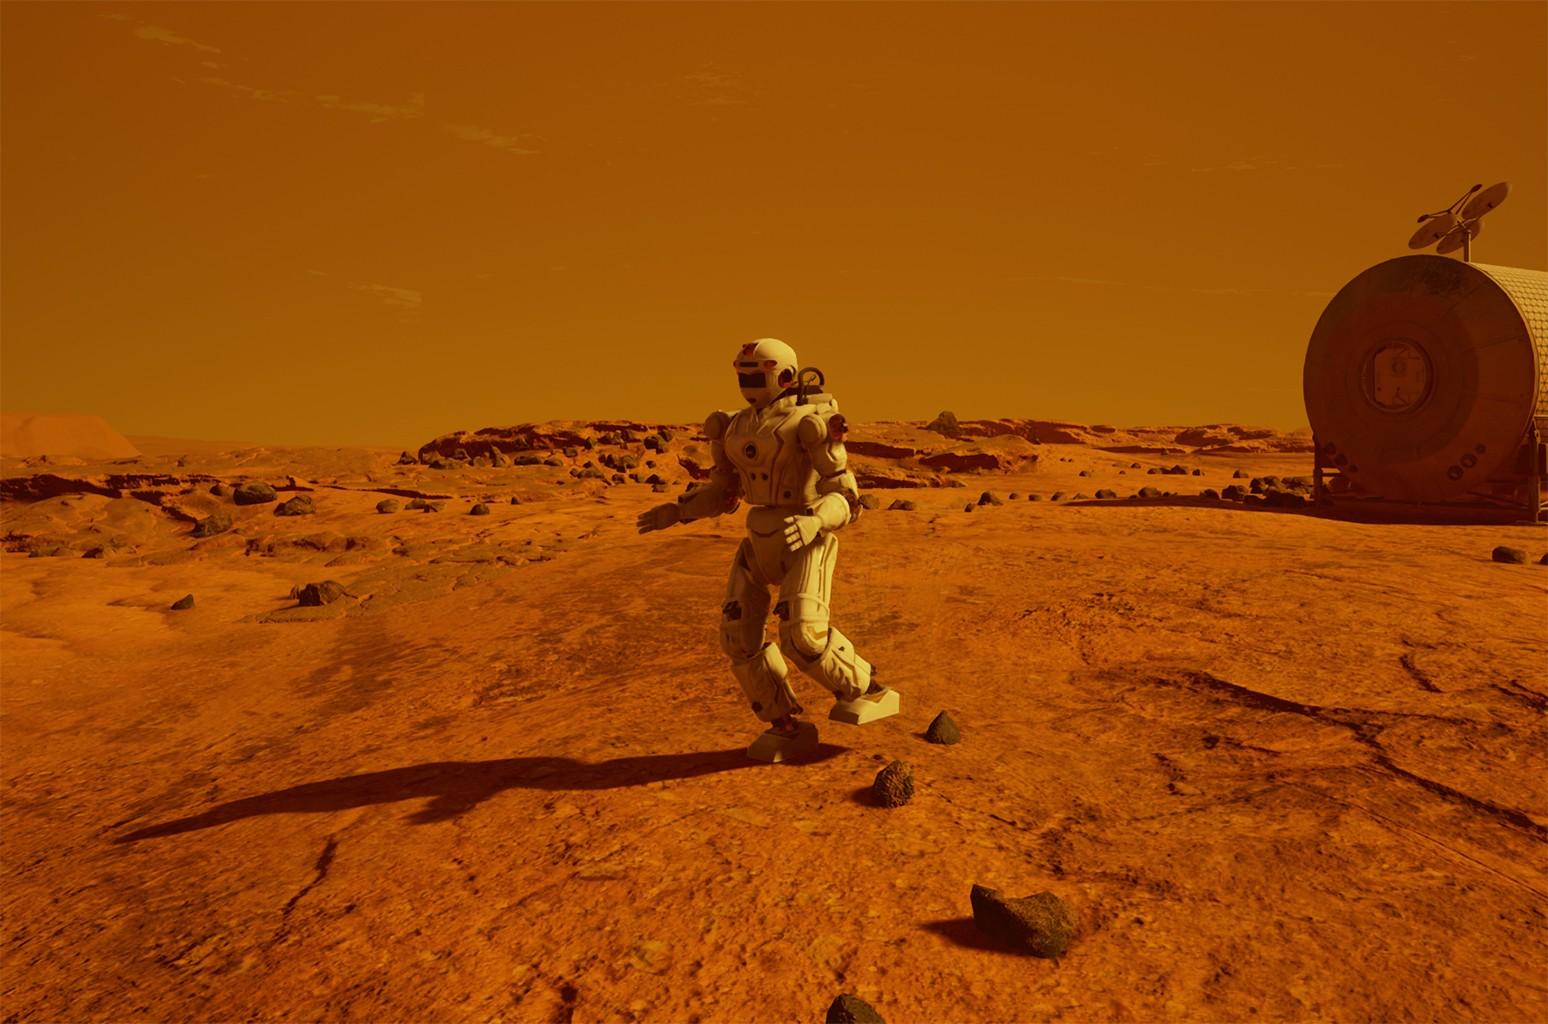 FUSION's Mars 2030